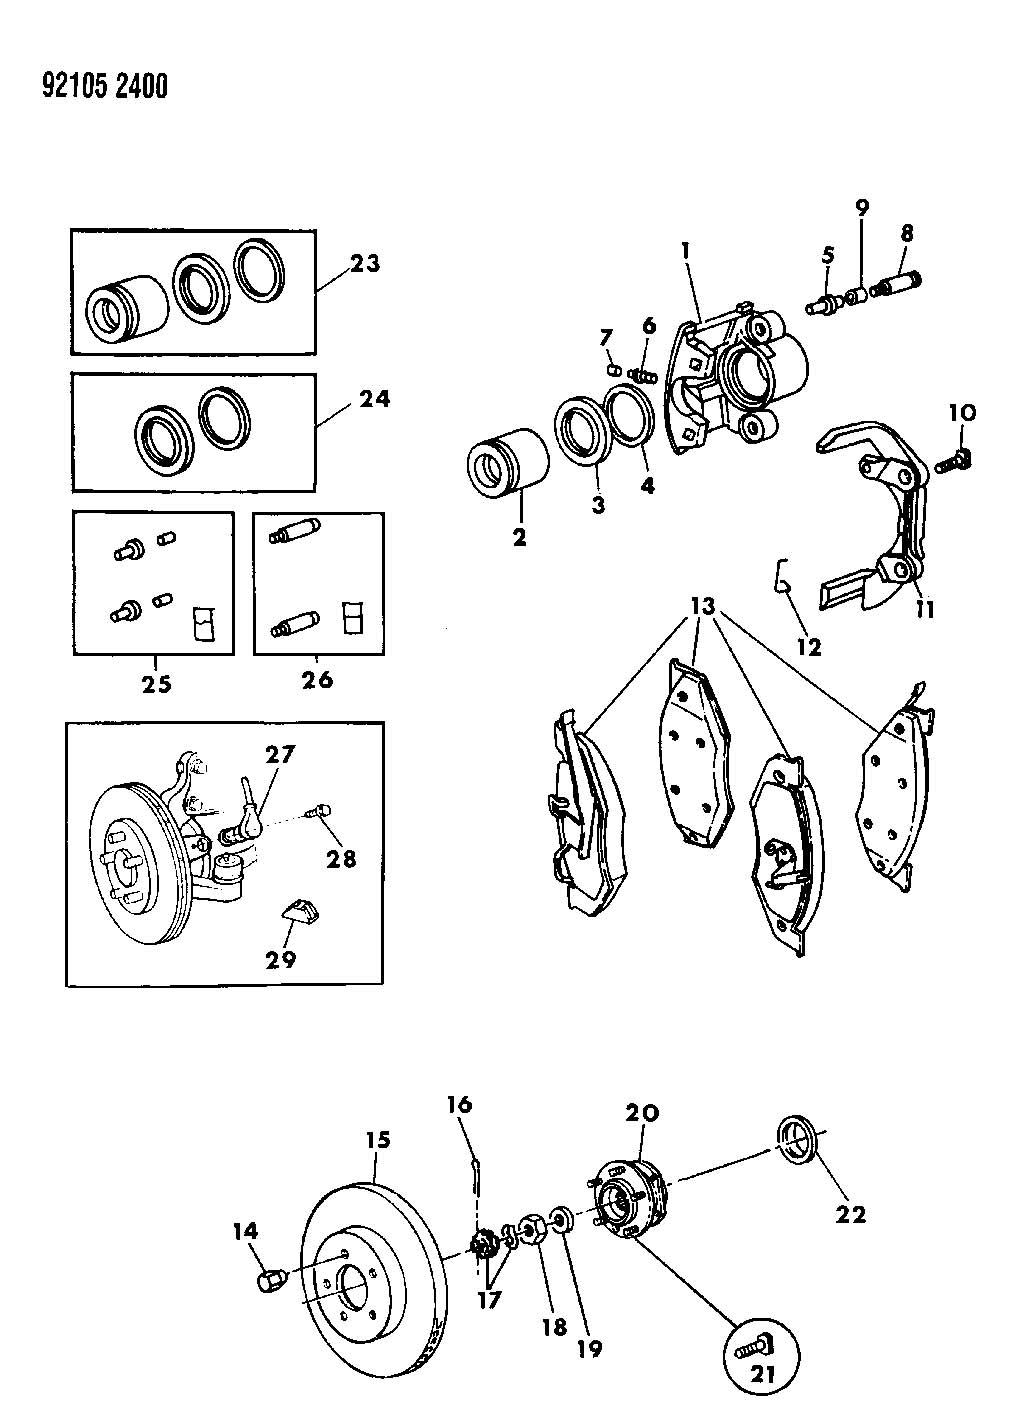 Service manual [1992 Chrysler Lebaron Rear Differential